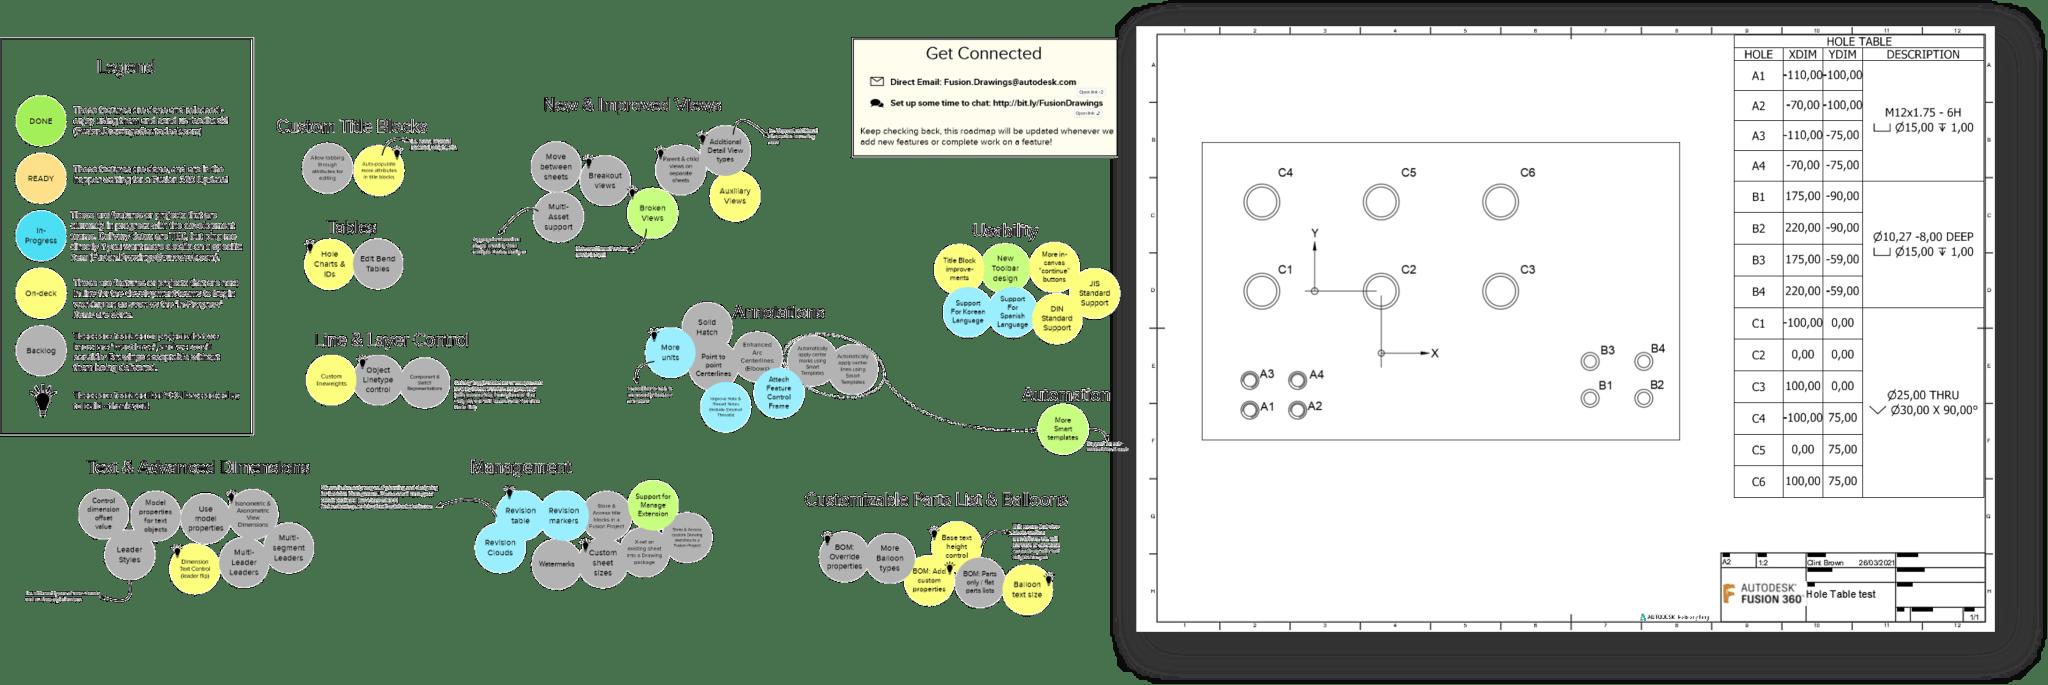 fusion-360-drawings-roadmap